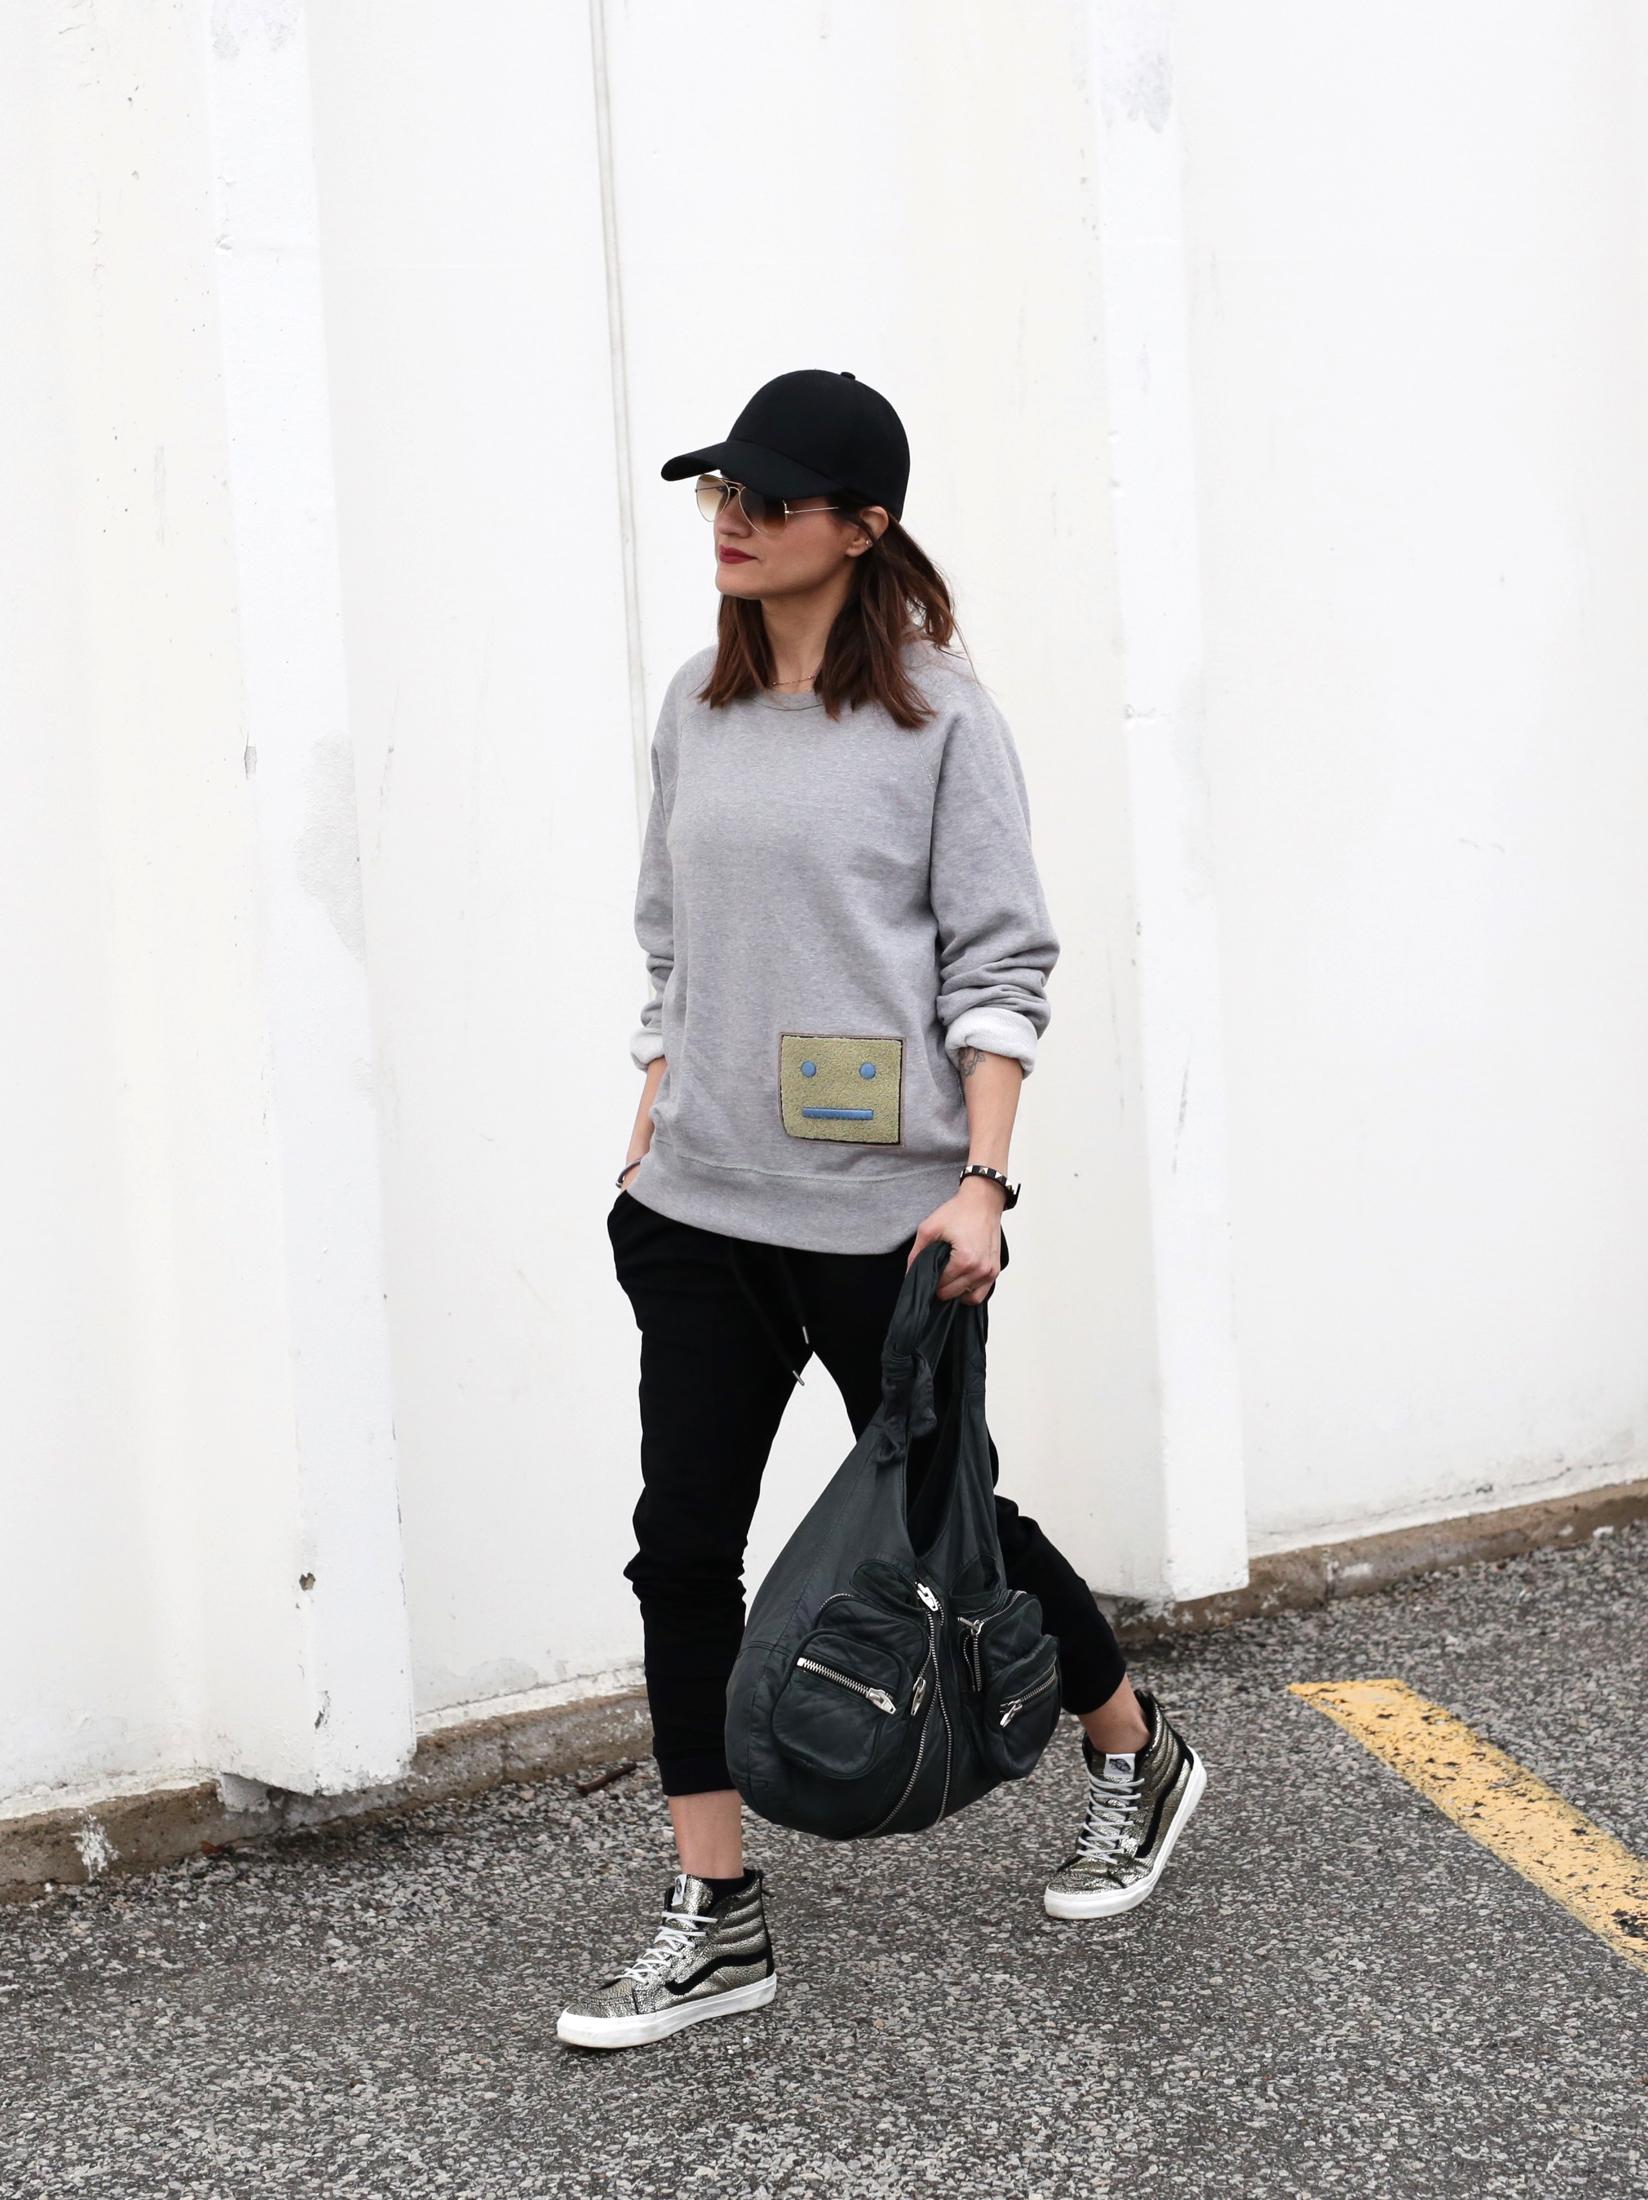 3 Ways To Rock Athleisure Wear - Leather Jacket, Acne Sweater, Alexander Wang Donna bag, metallic Vans sneakers_7641.JPG